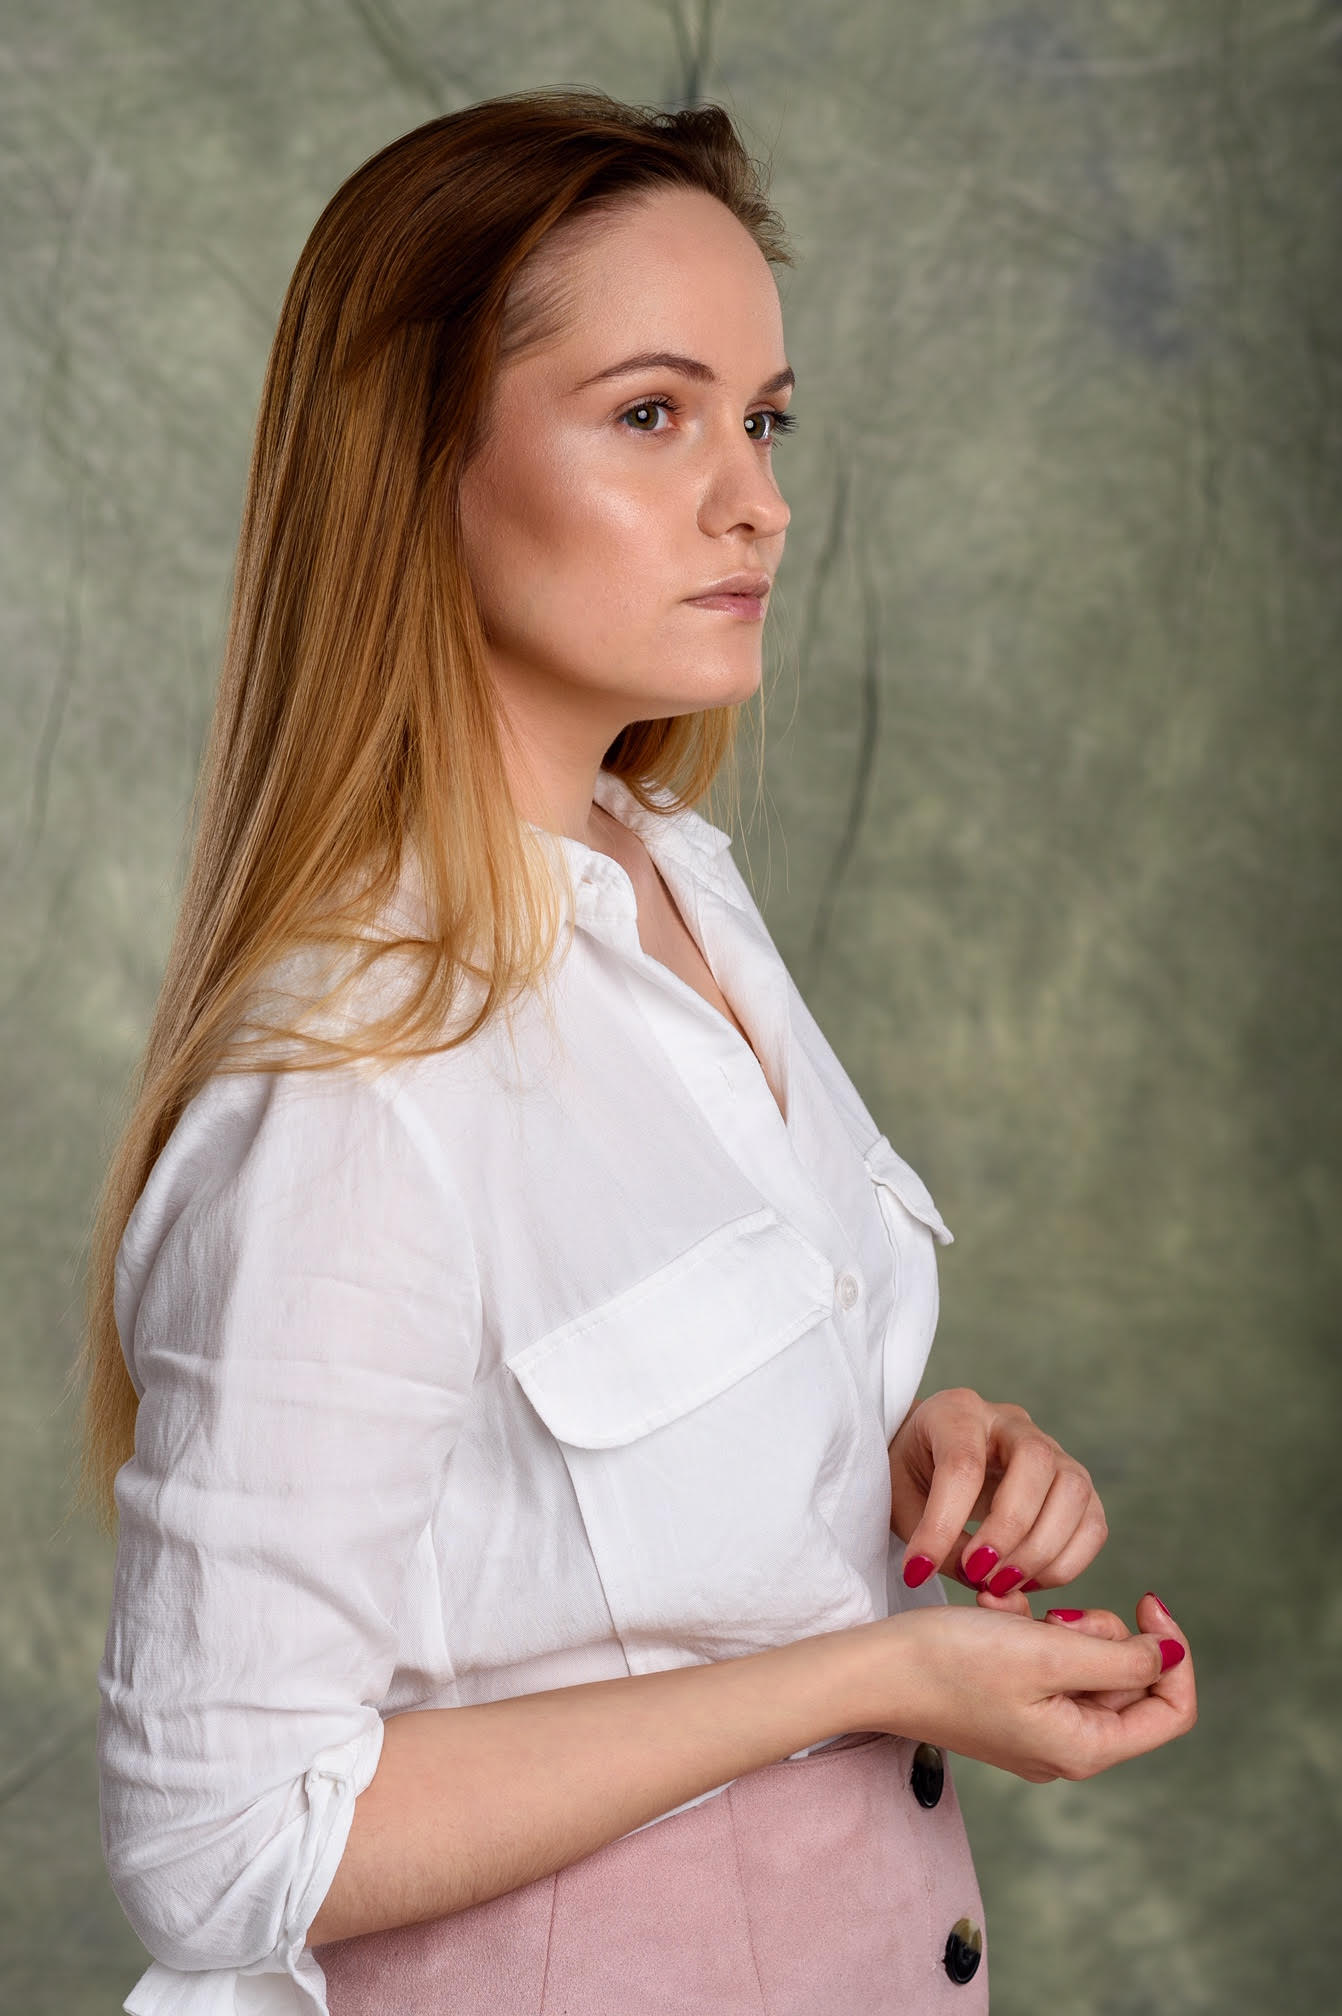 Michalina Robakiewicz IQ ART Agencja Aktorska 002